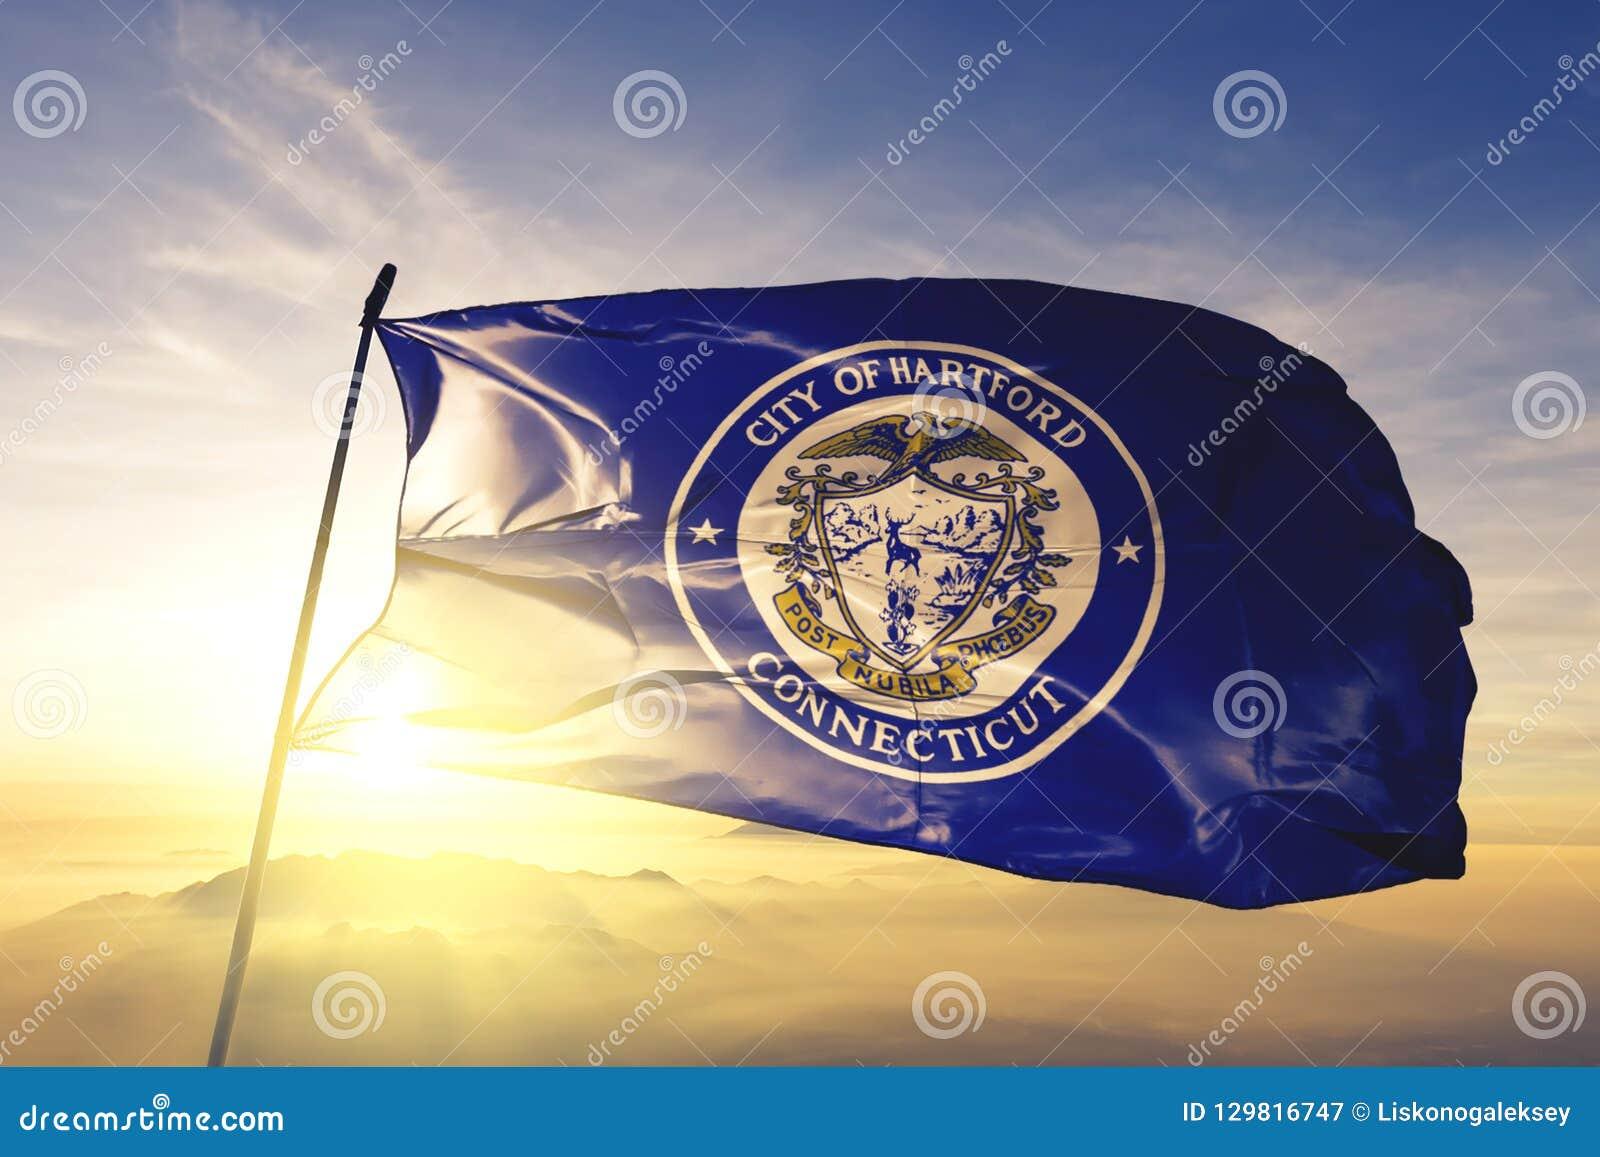 Capital de la ciudad de Hartford de Connecticut de la tela del paño de la materia textil de la bandera de Estados Unidos que agit